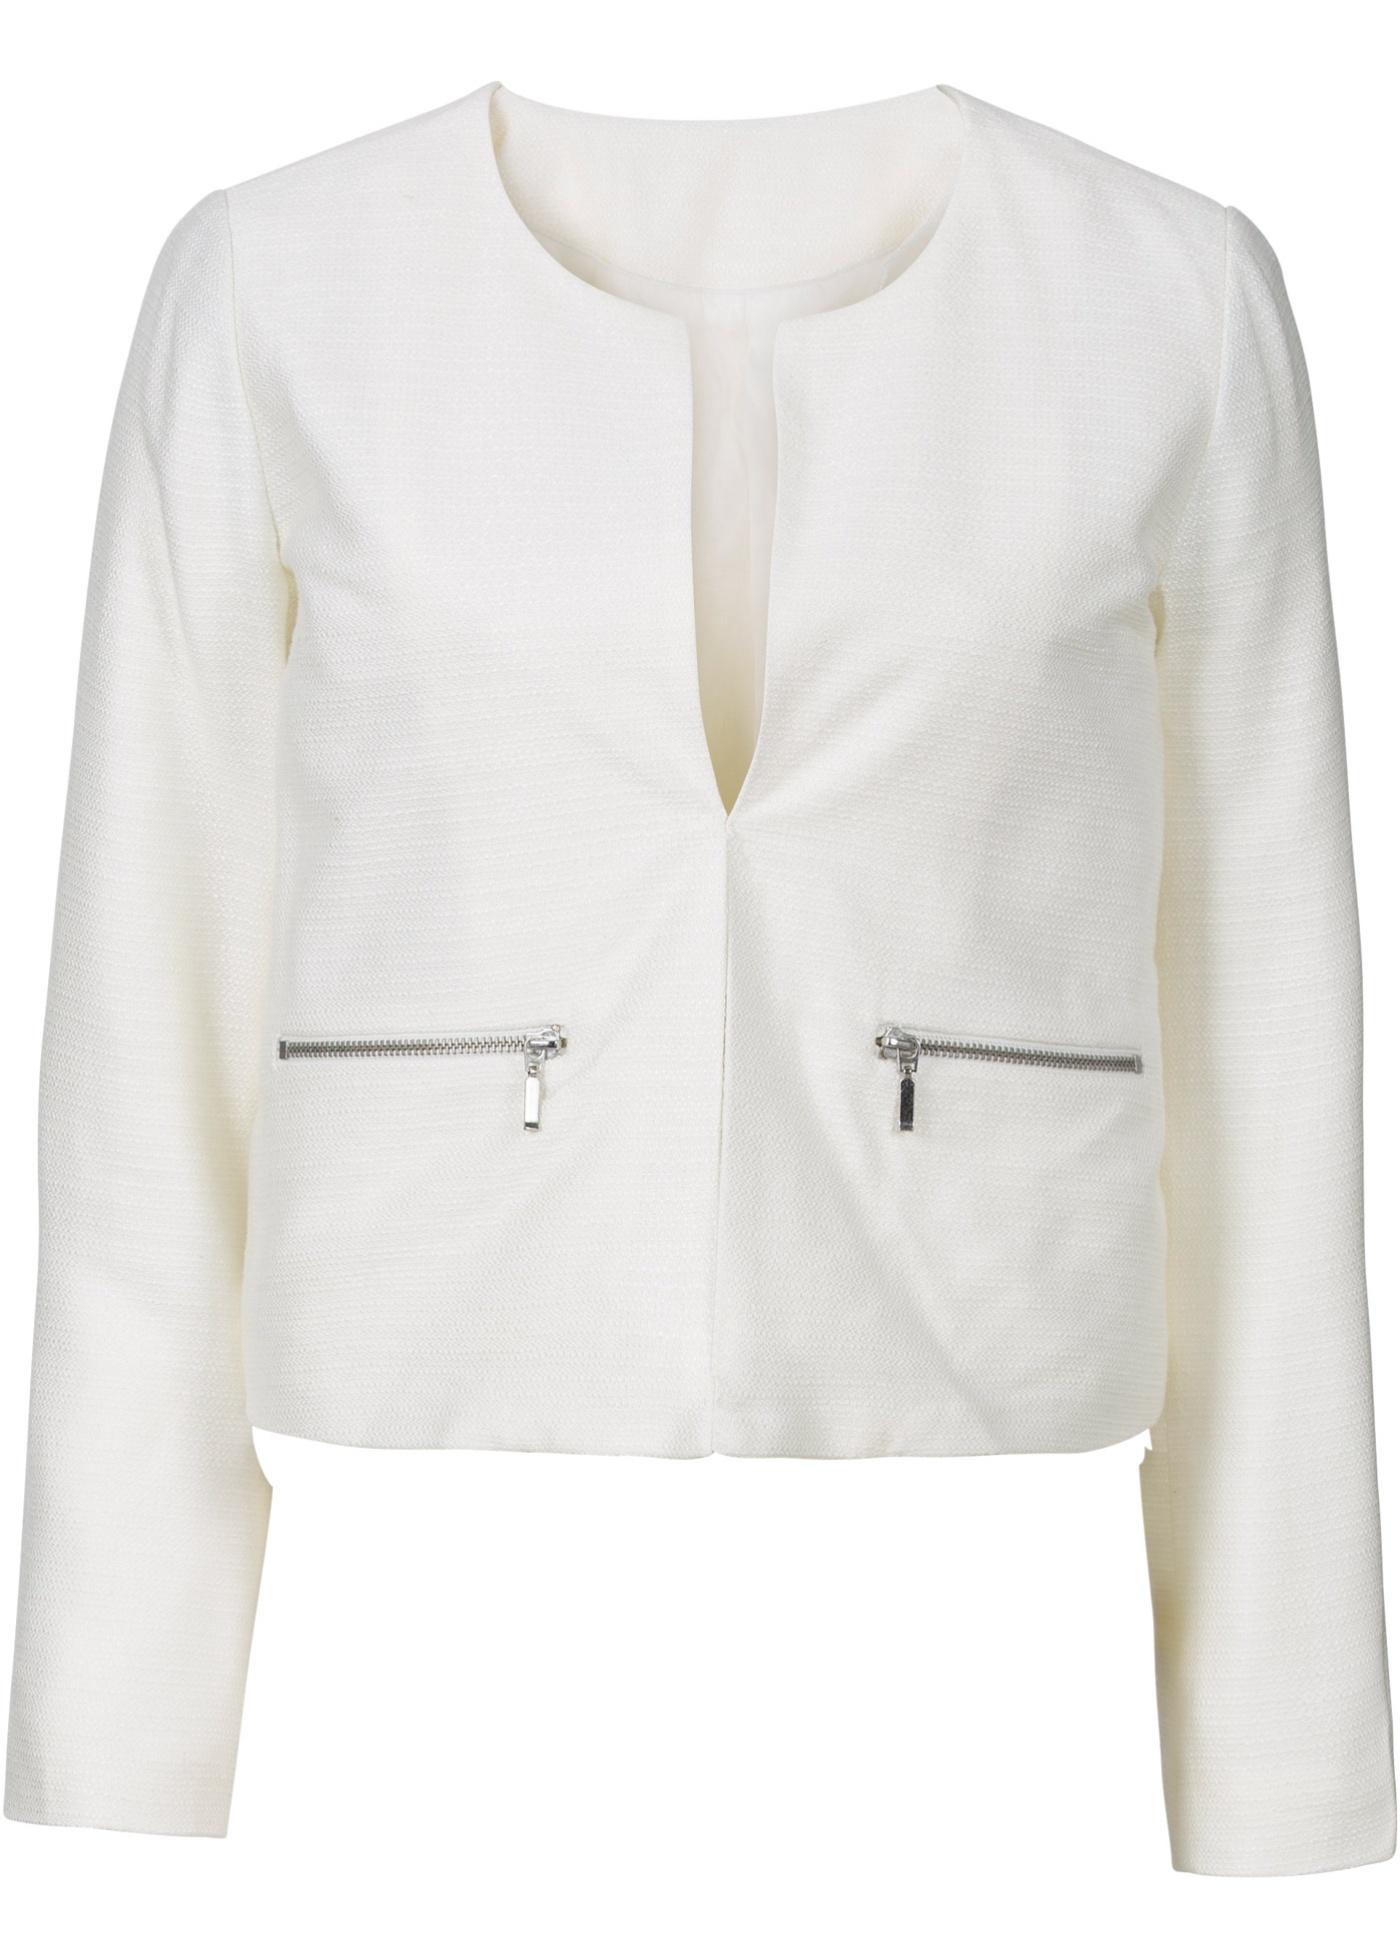 blazer blanc pas cher femme mode2. Black Bedroom Furniture Sets. Home Design Ideas